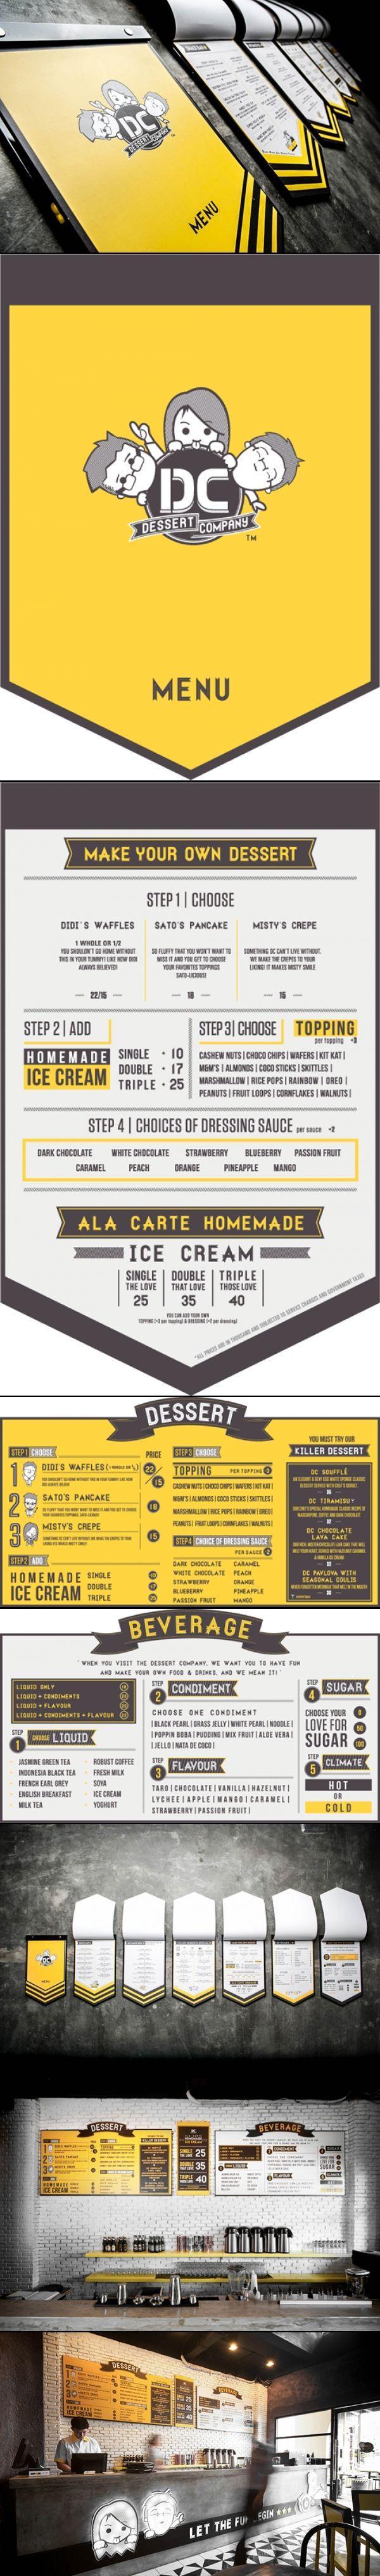 Dessert Company | Egghead